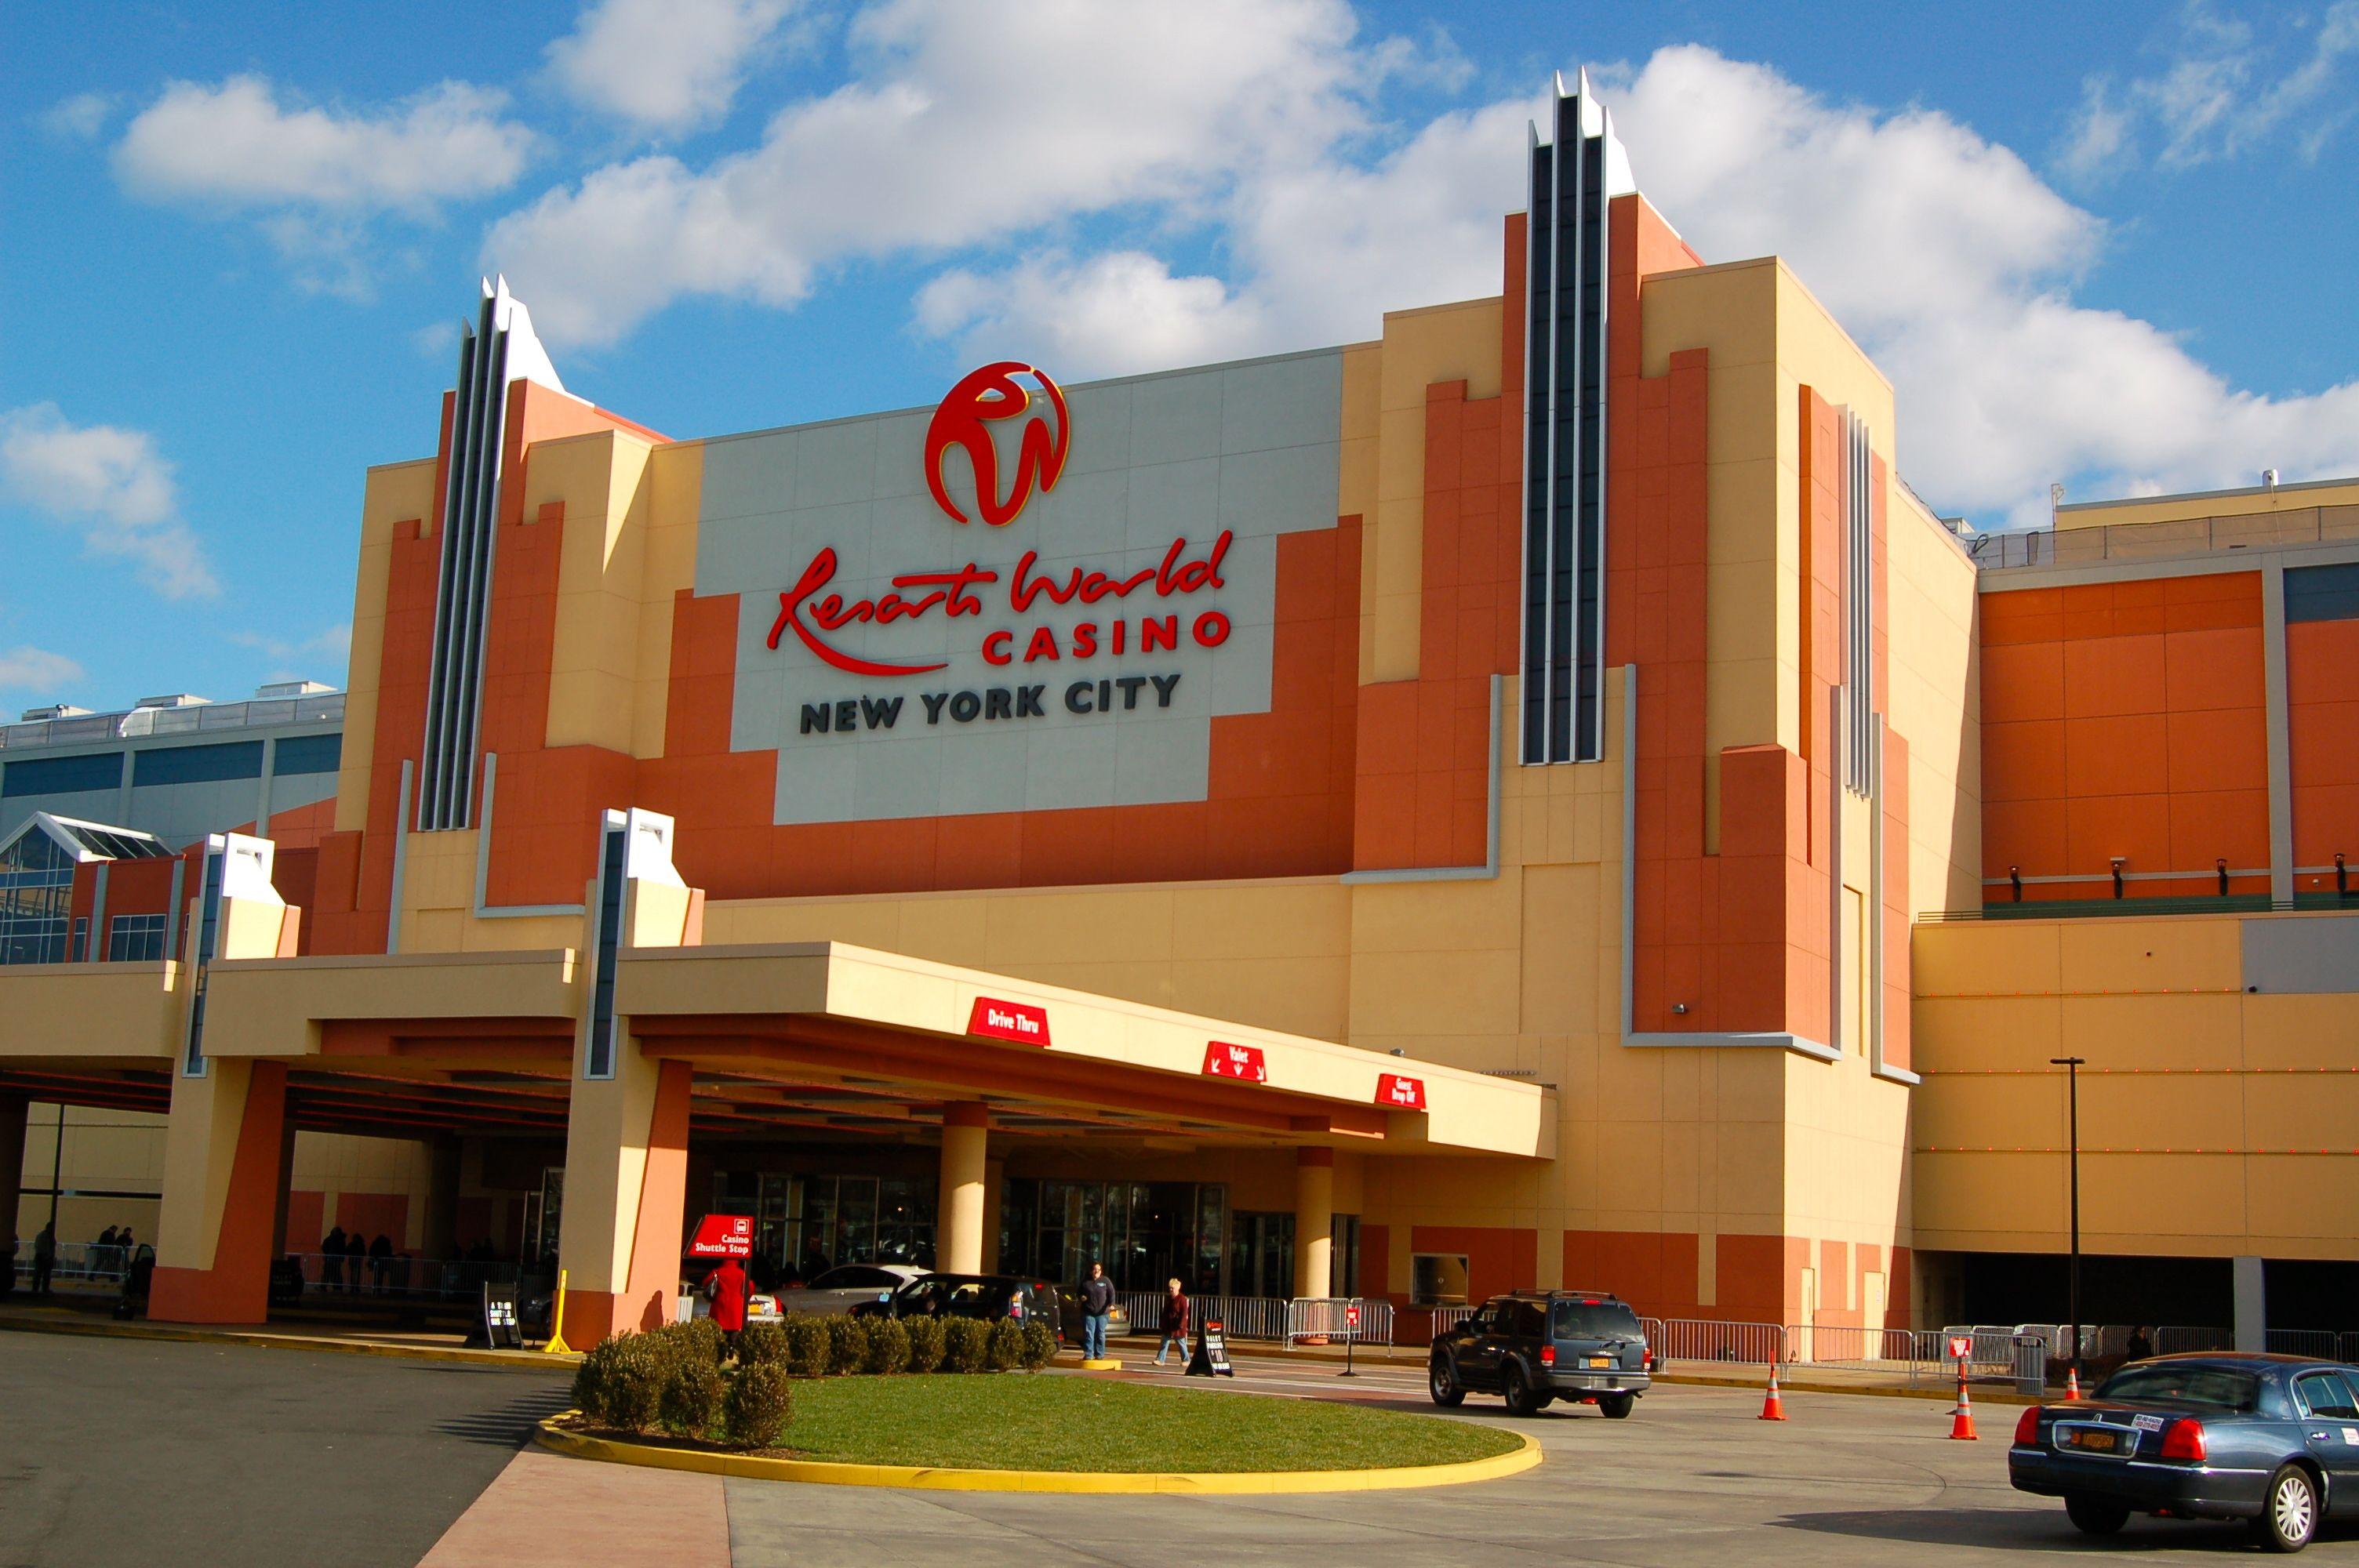 Casino new online york i казино израиль